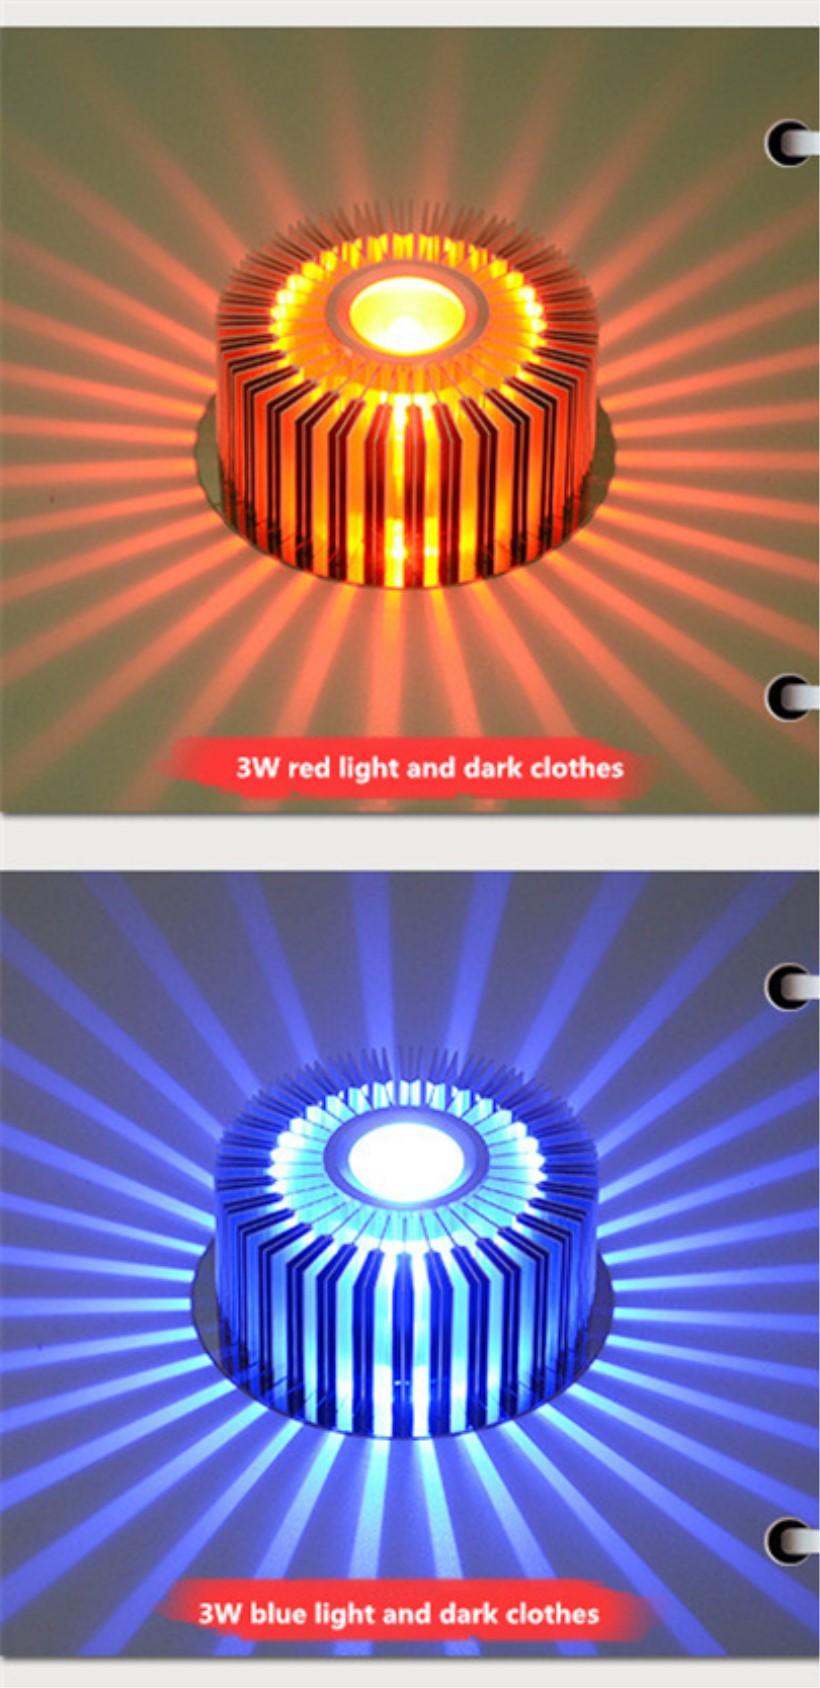 LED Crystal Aisle Celling Light (3)